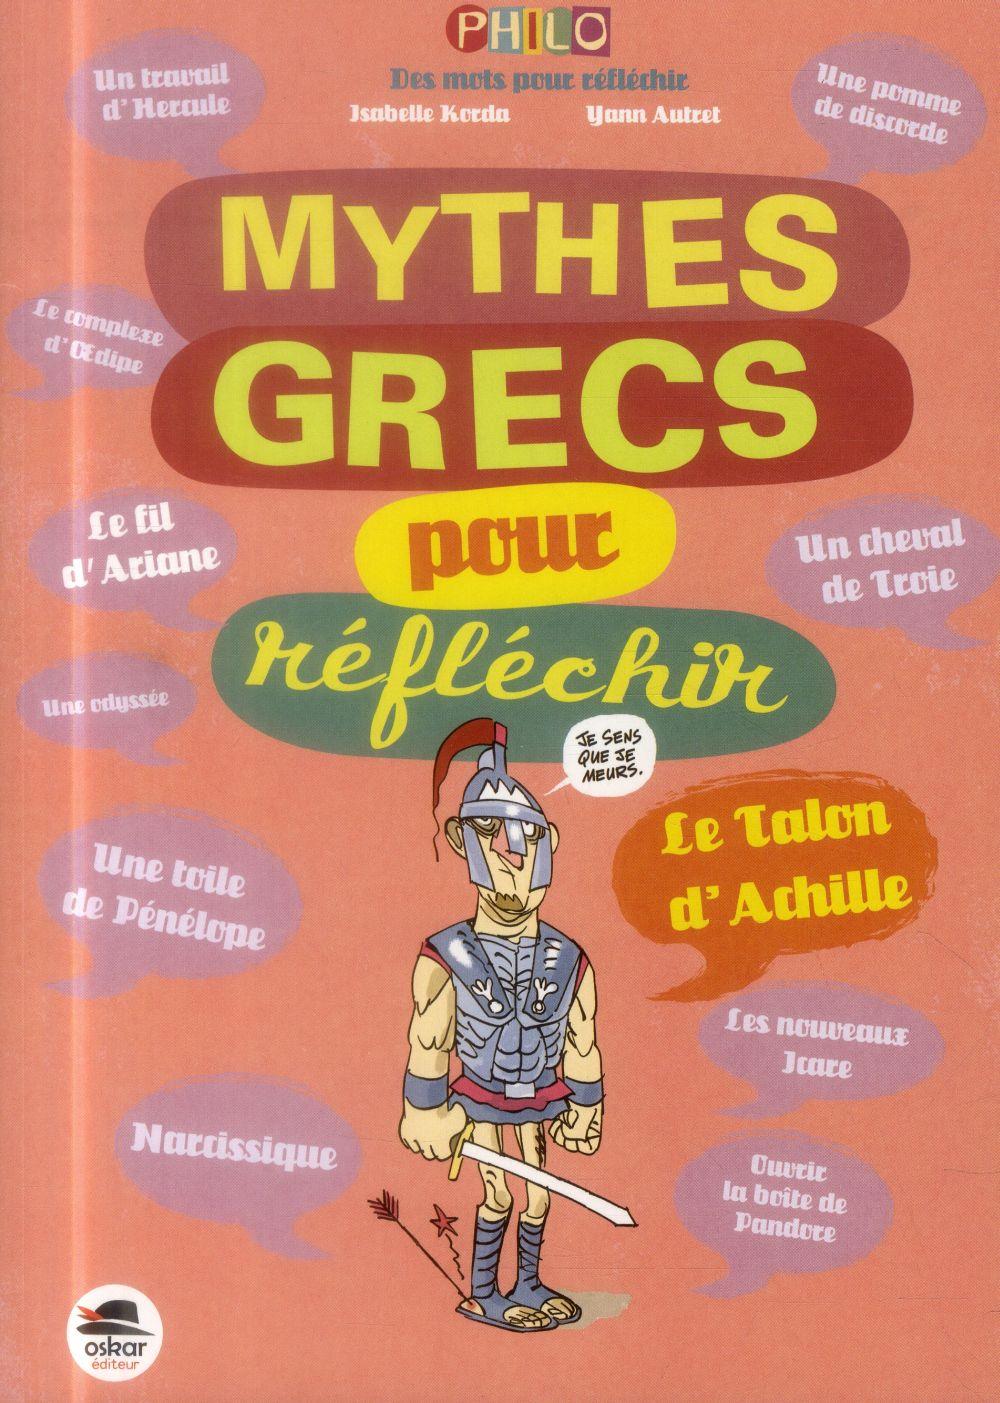 MYTHES GRECS - NOUVELLE EDITION ISABELLE C. OSKAR